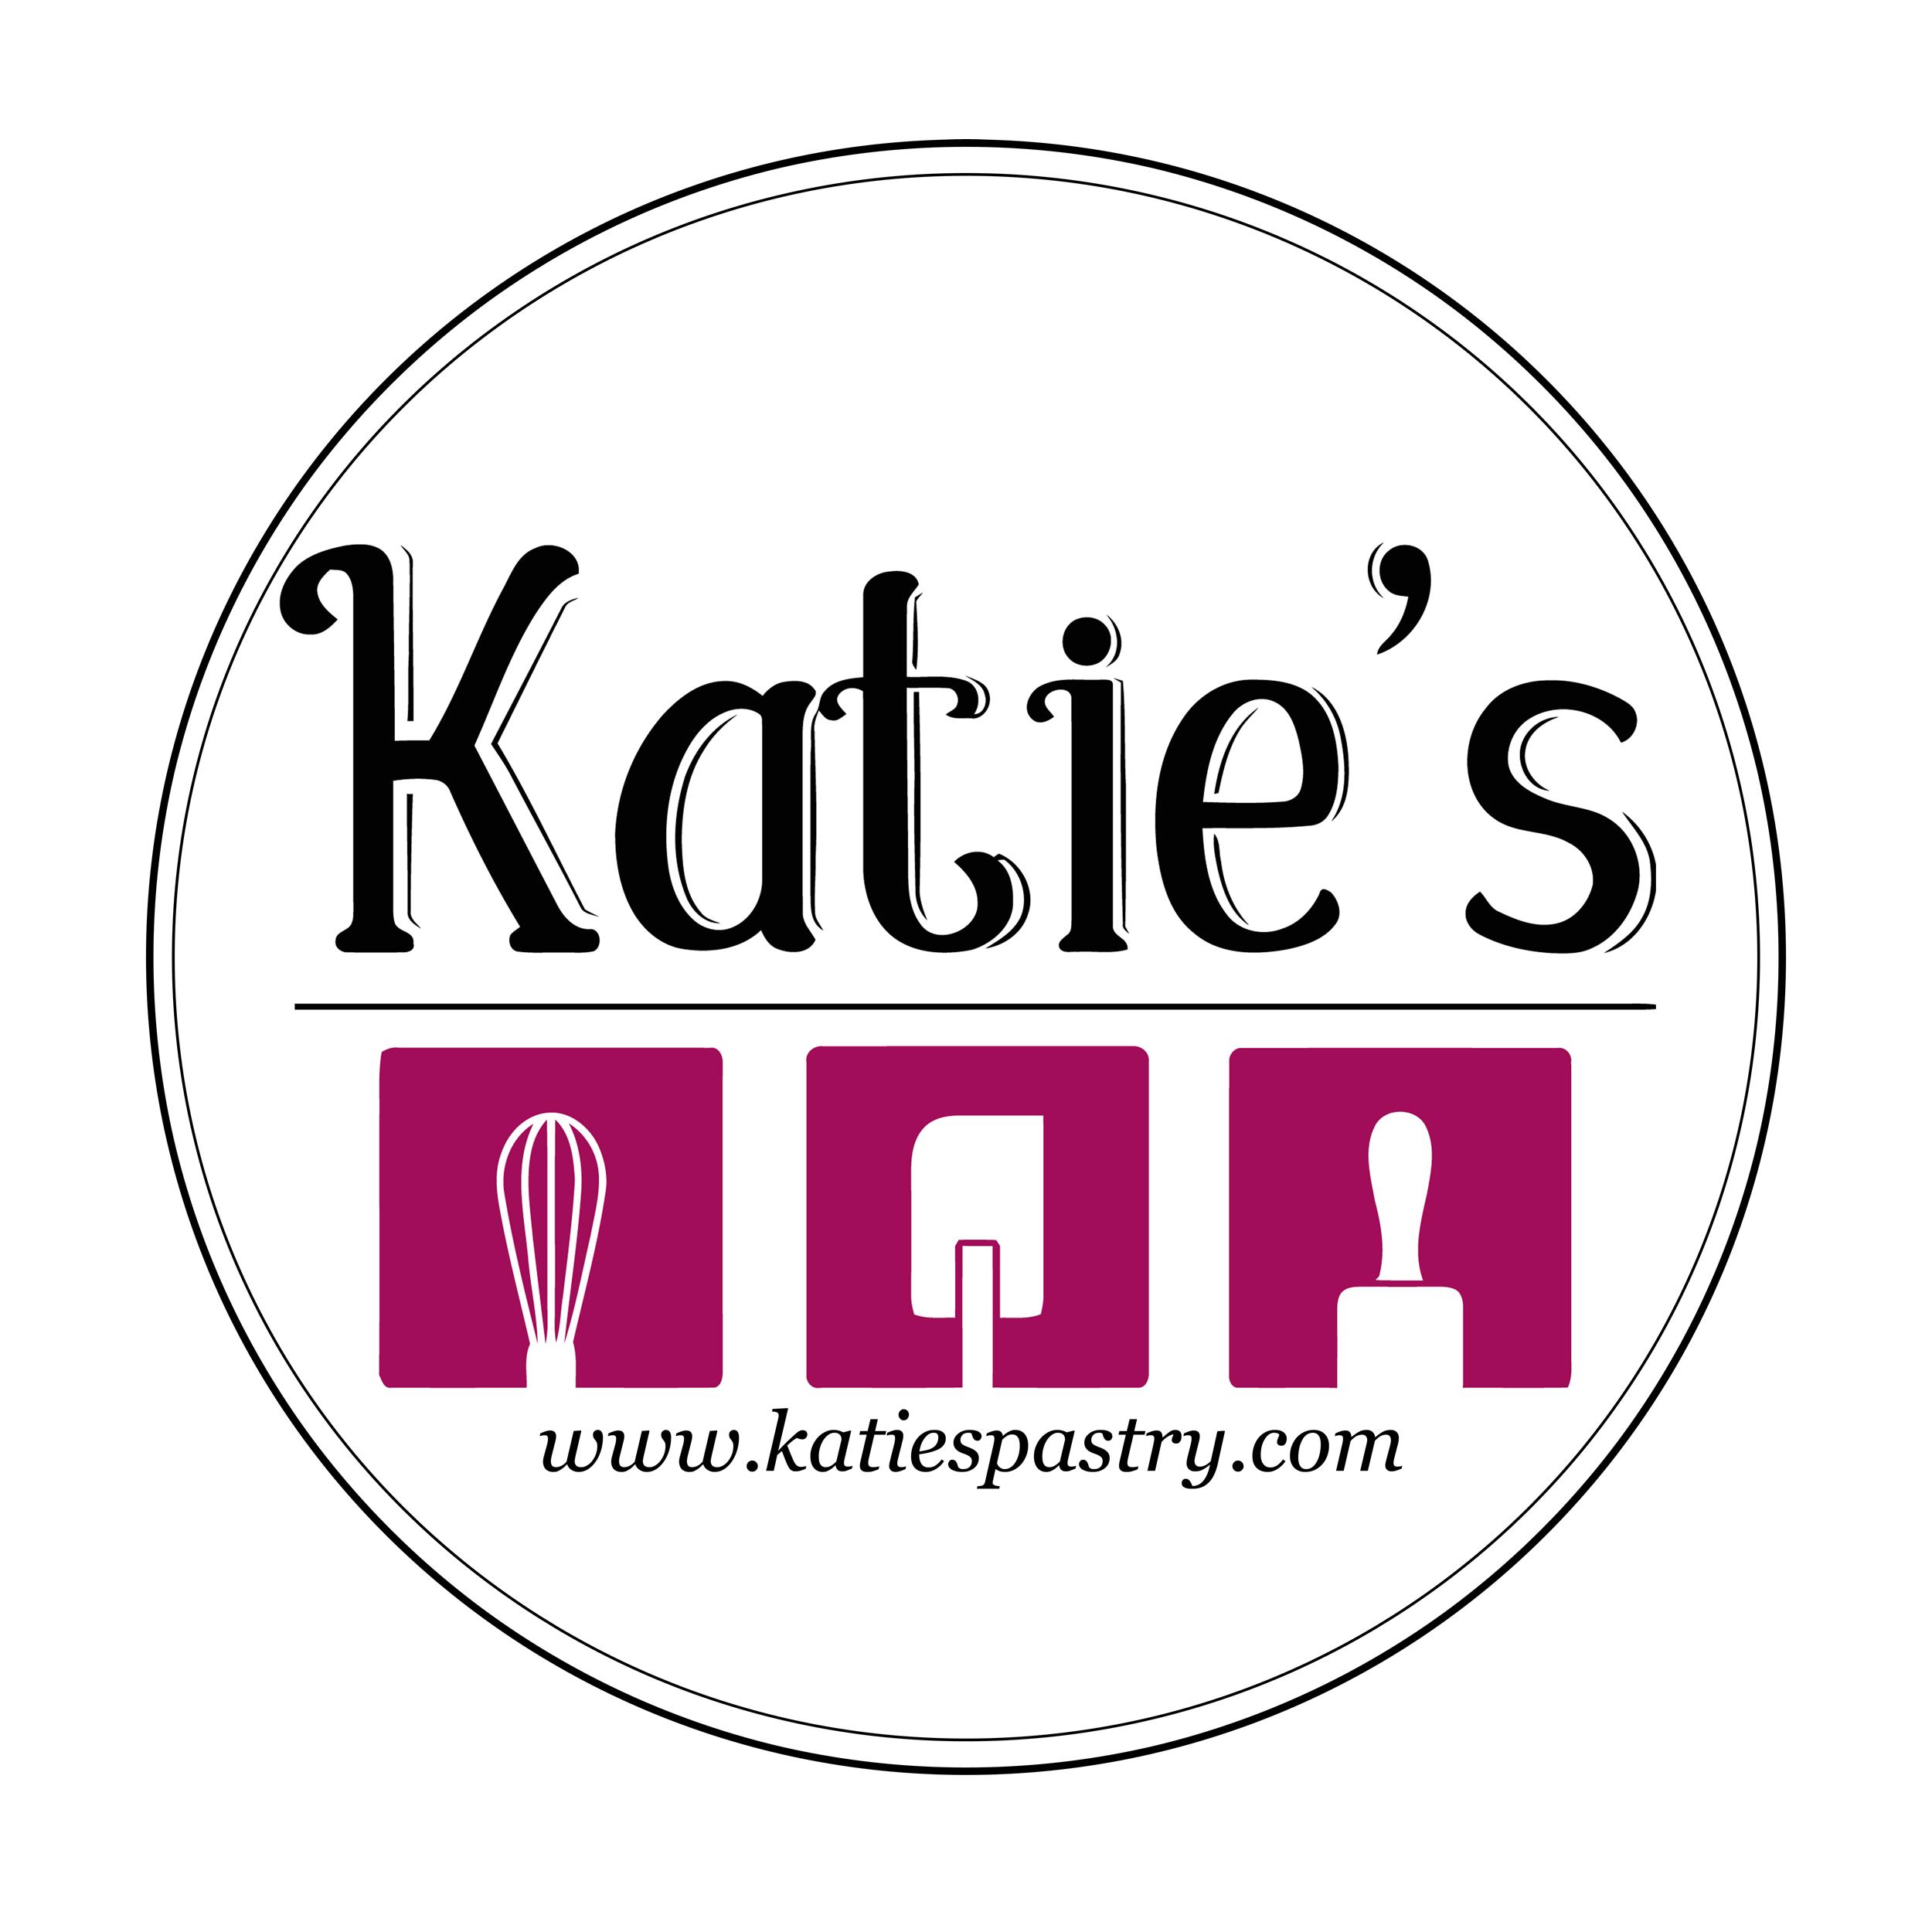 Katie's Pastry